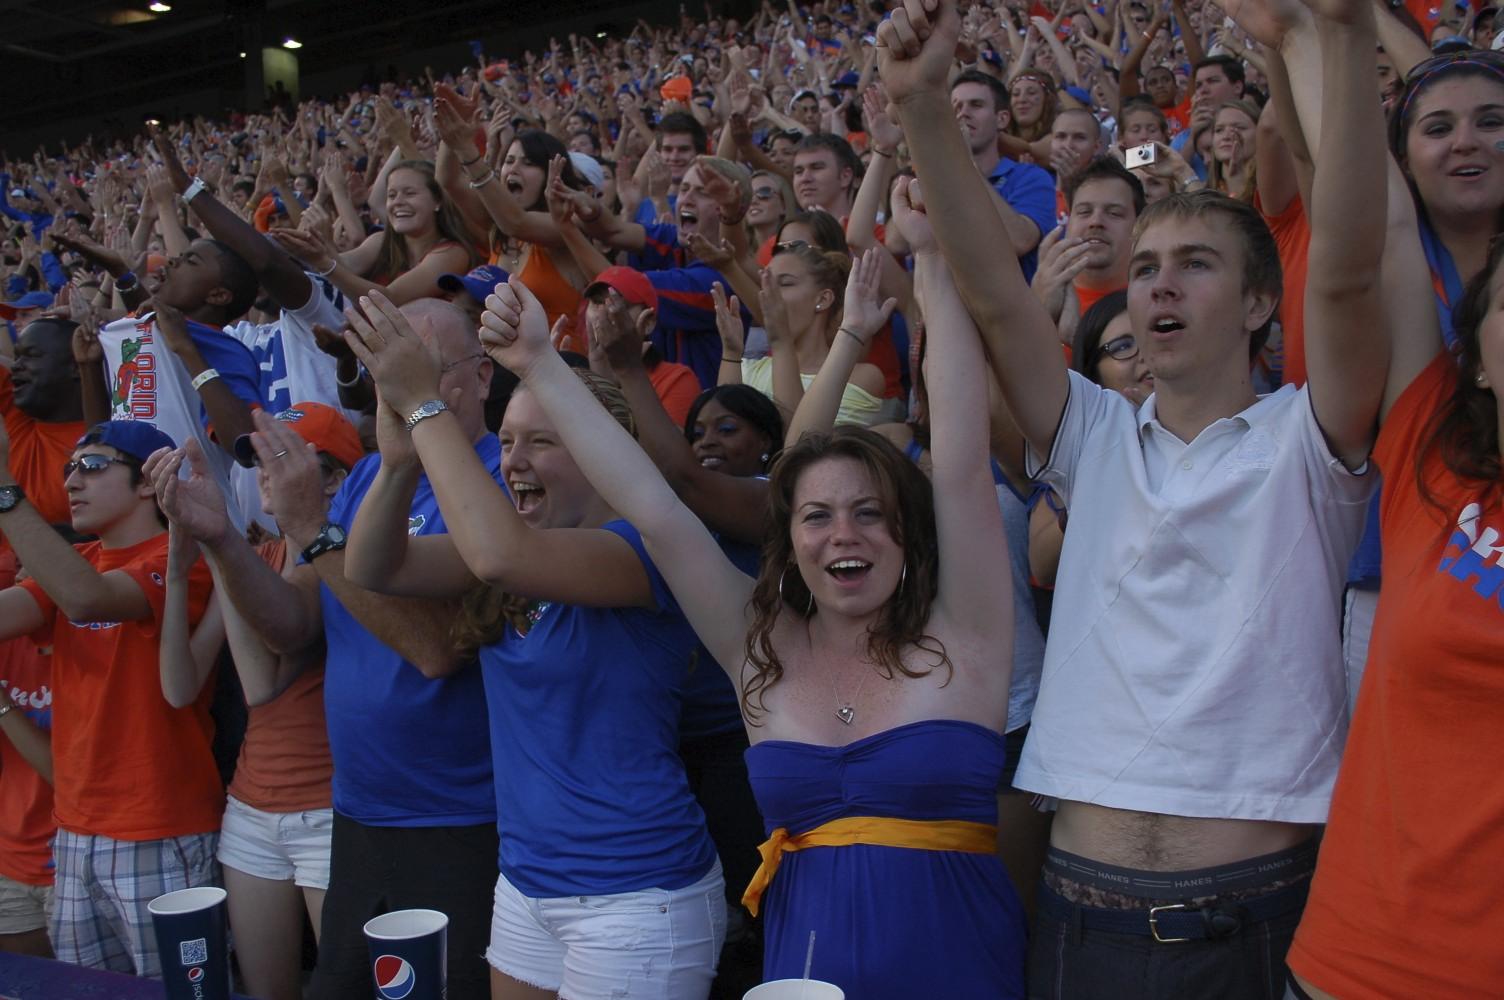 Gators fans celebrating after a Florida touchdown.